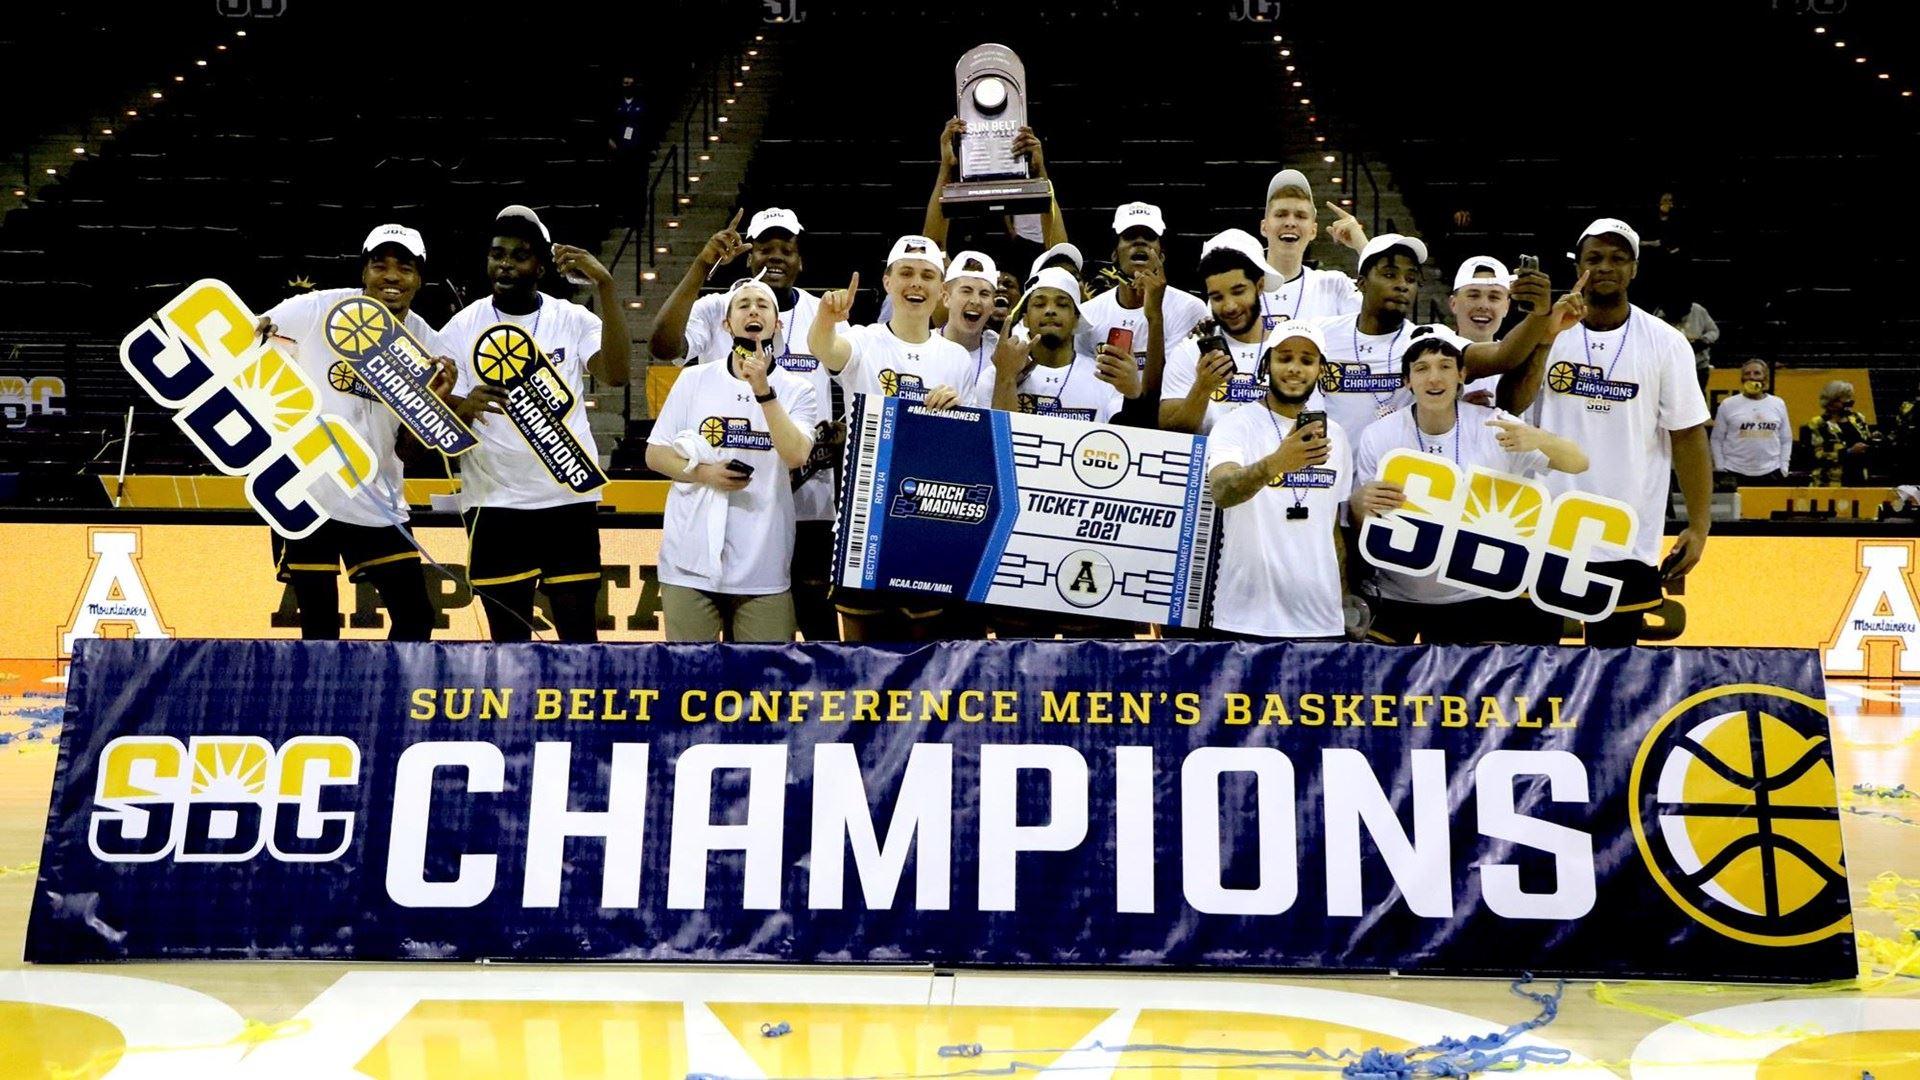 Appalachian State men's basketball wins 2021 Sun Belt Conference Championship (Photo: AppStateSports.com)